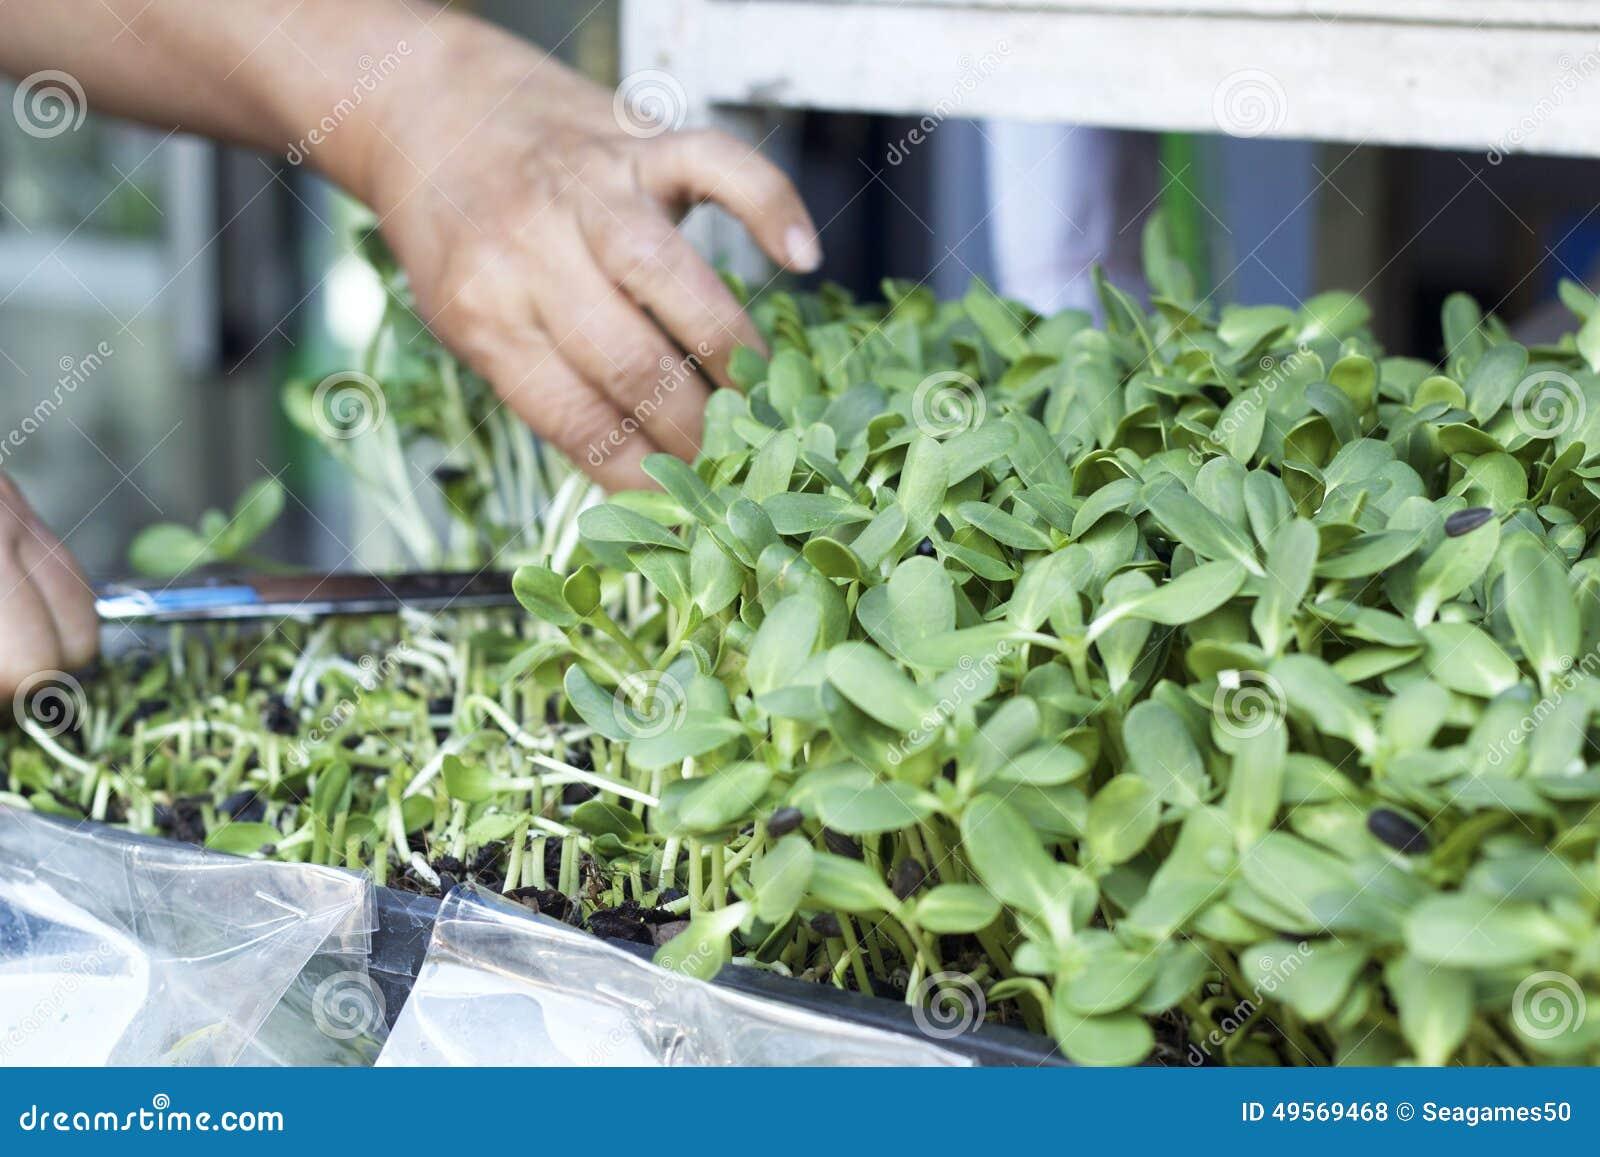 Planta el girasol débil con la naturaleza